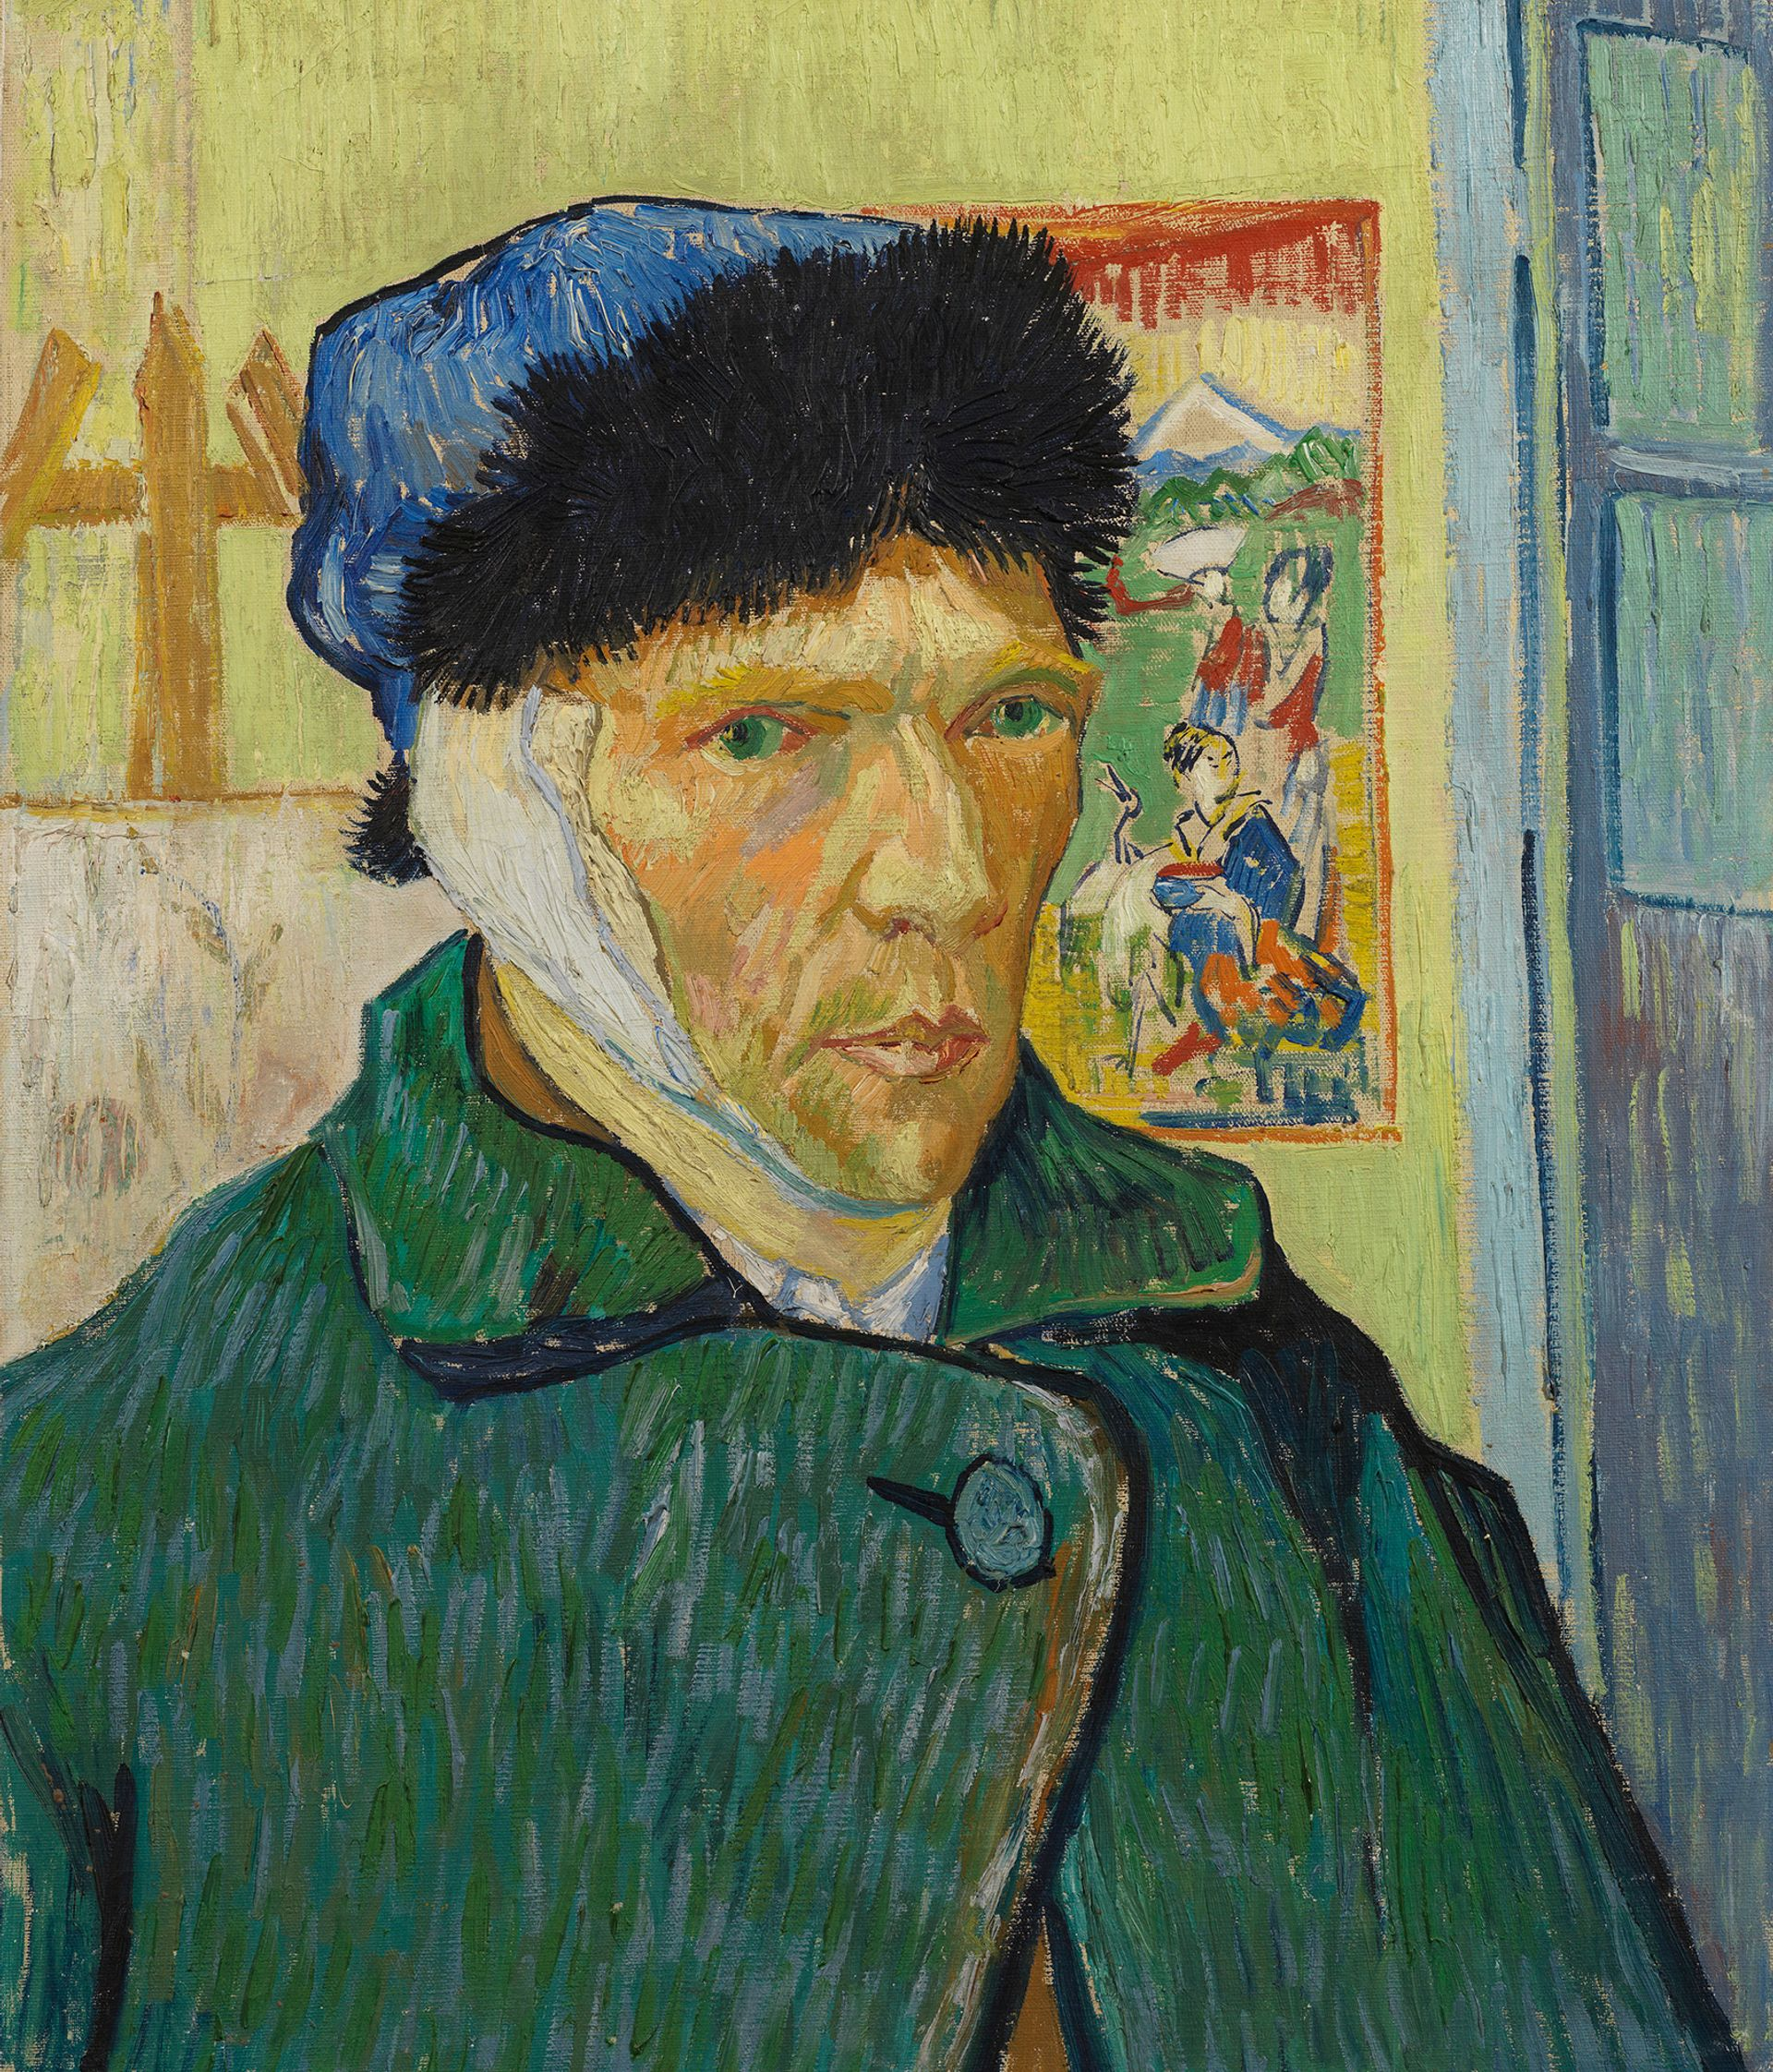 Vincent van Gogh's Self-portrait with bandaged Ear (1889) © The Samuel Courtauld Trust, Courtauld Gallery, London